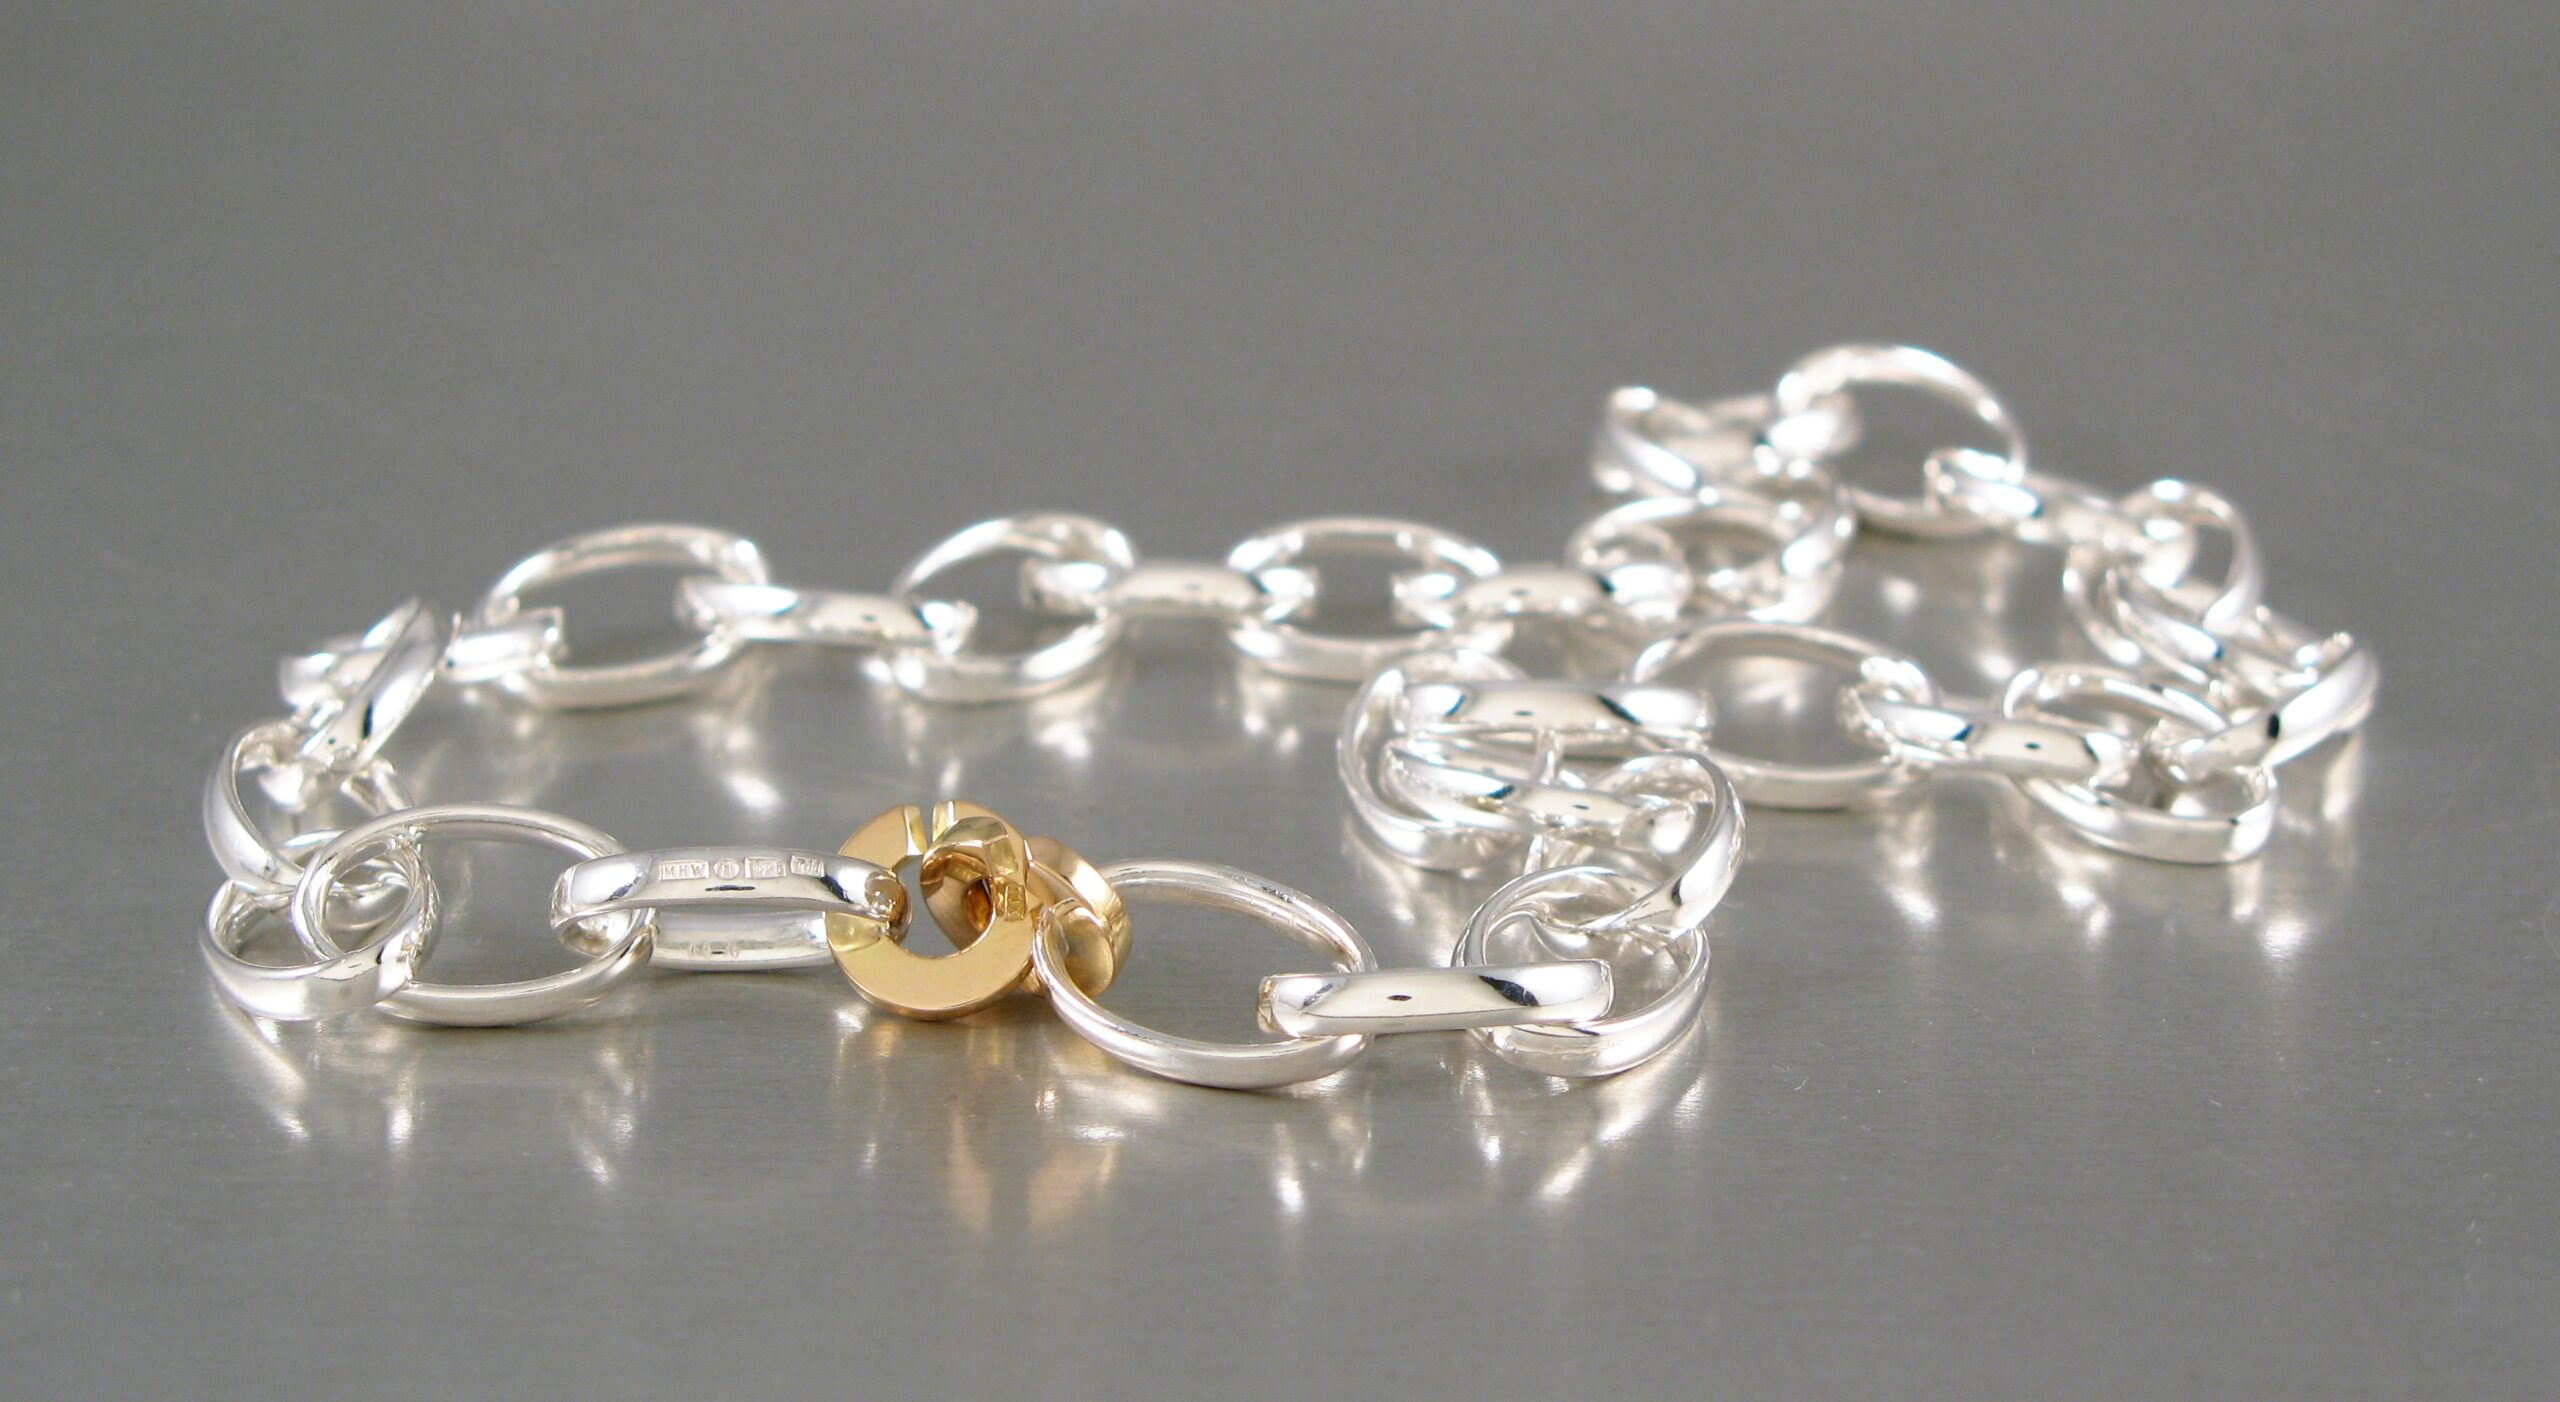 Collier, silver och guld